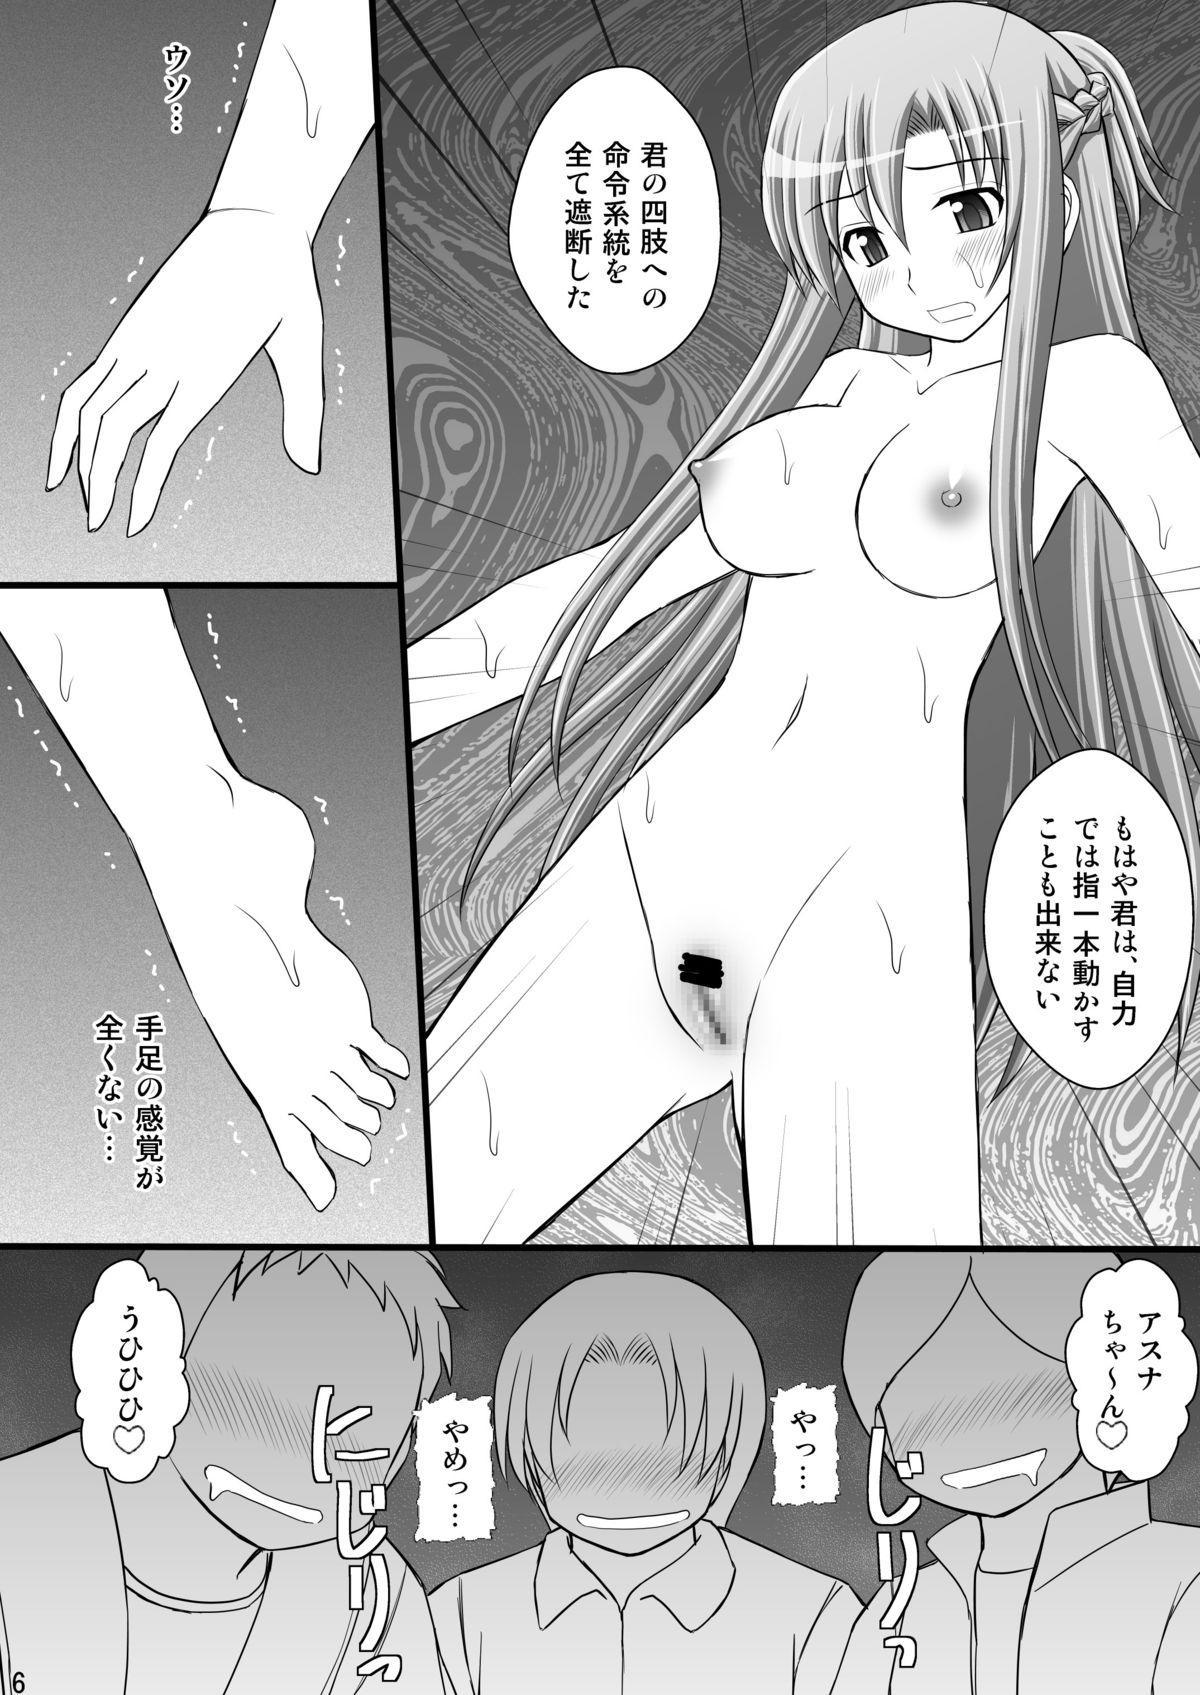 Toraware Hime II: Hostage Princess II 4